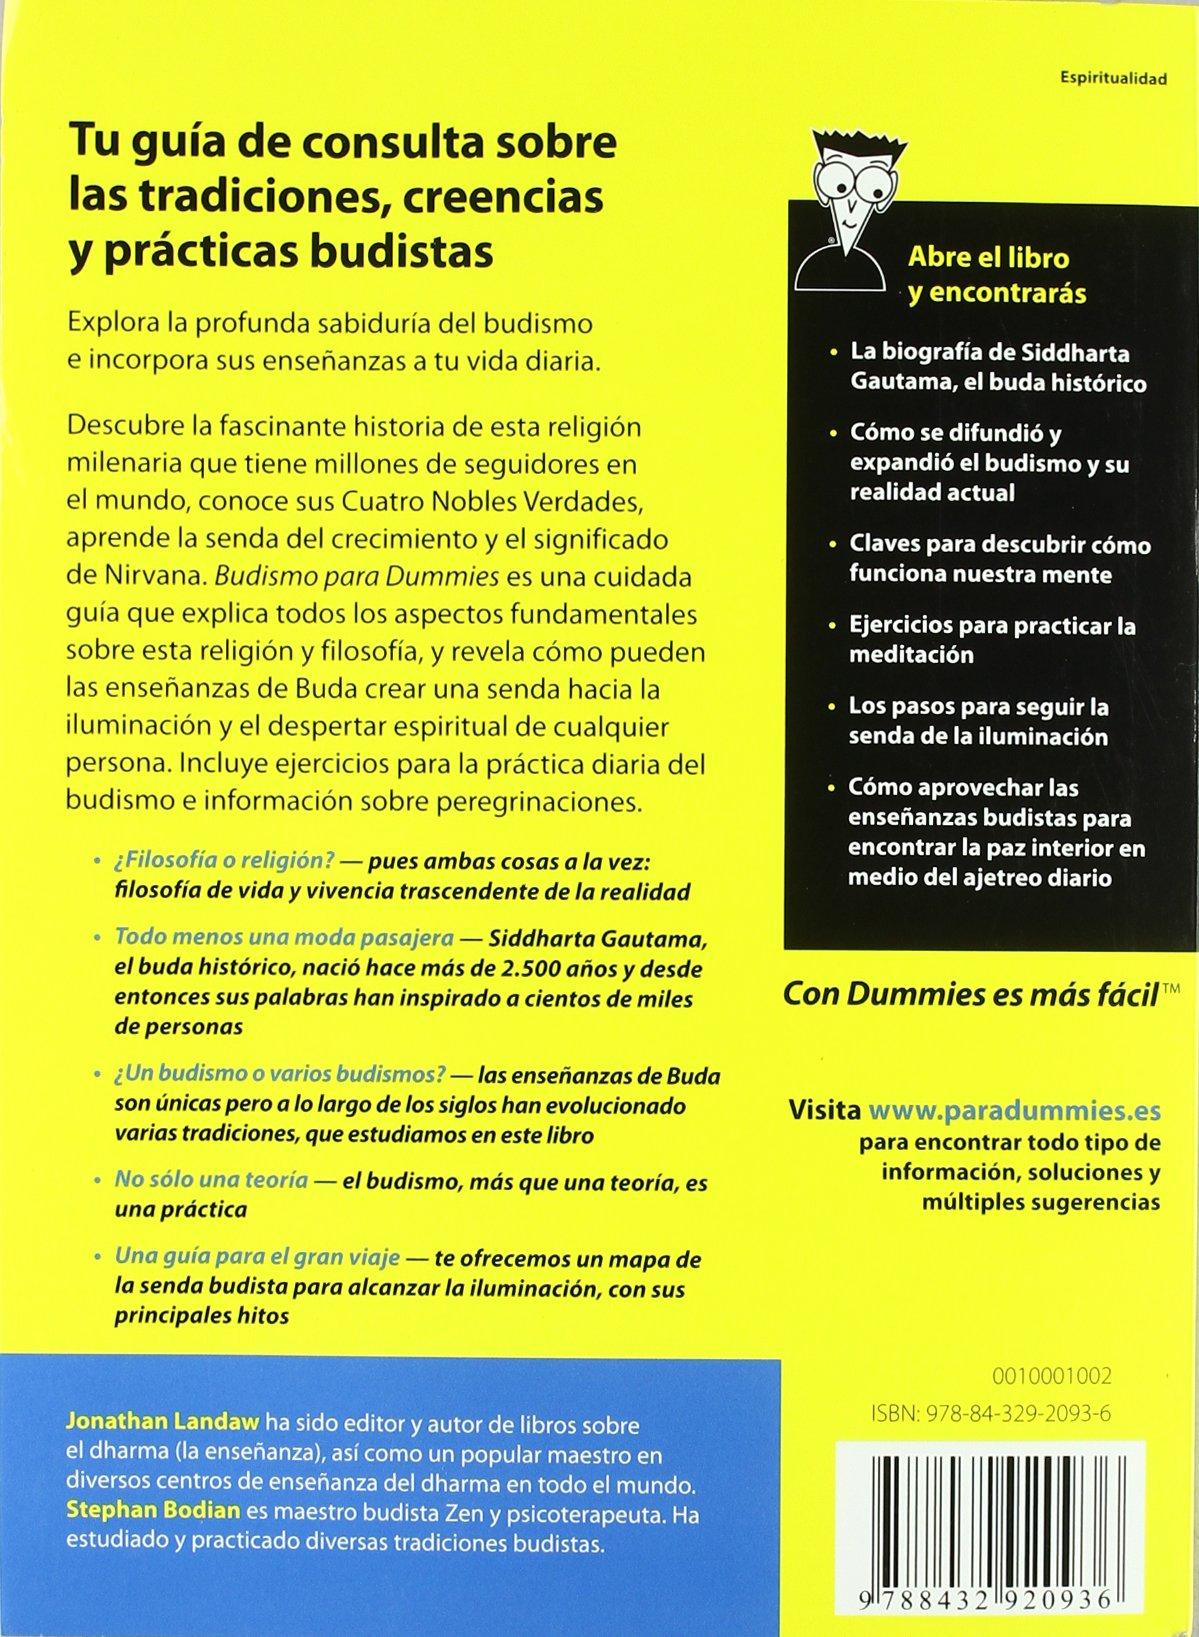 Budismo para Dummies: Amazon.es: Bodian, Stephan, Landaw, Jonathan ...